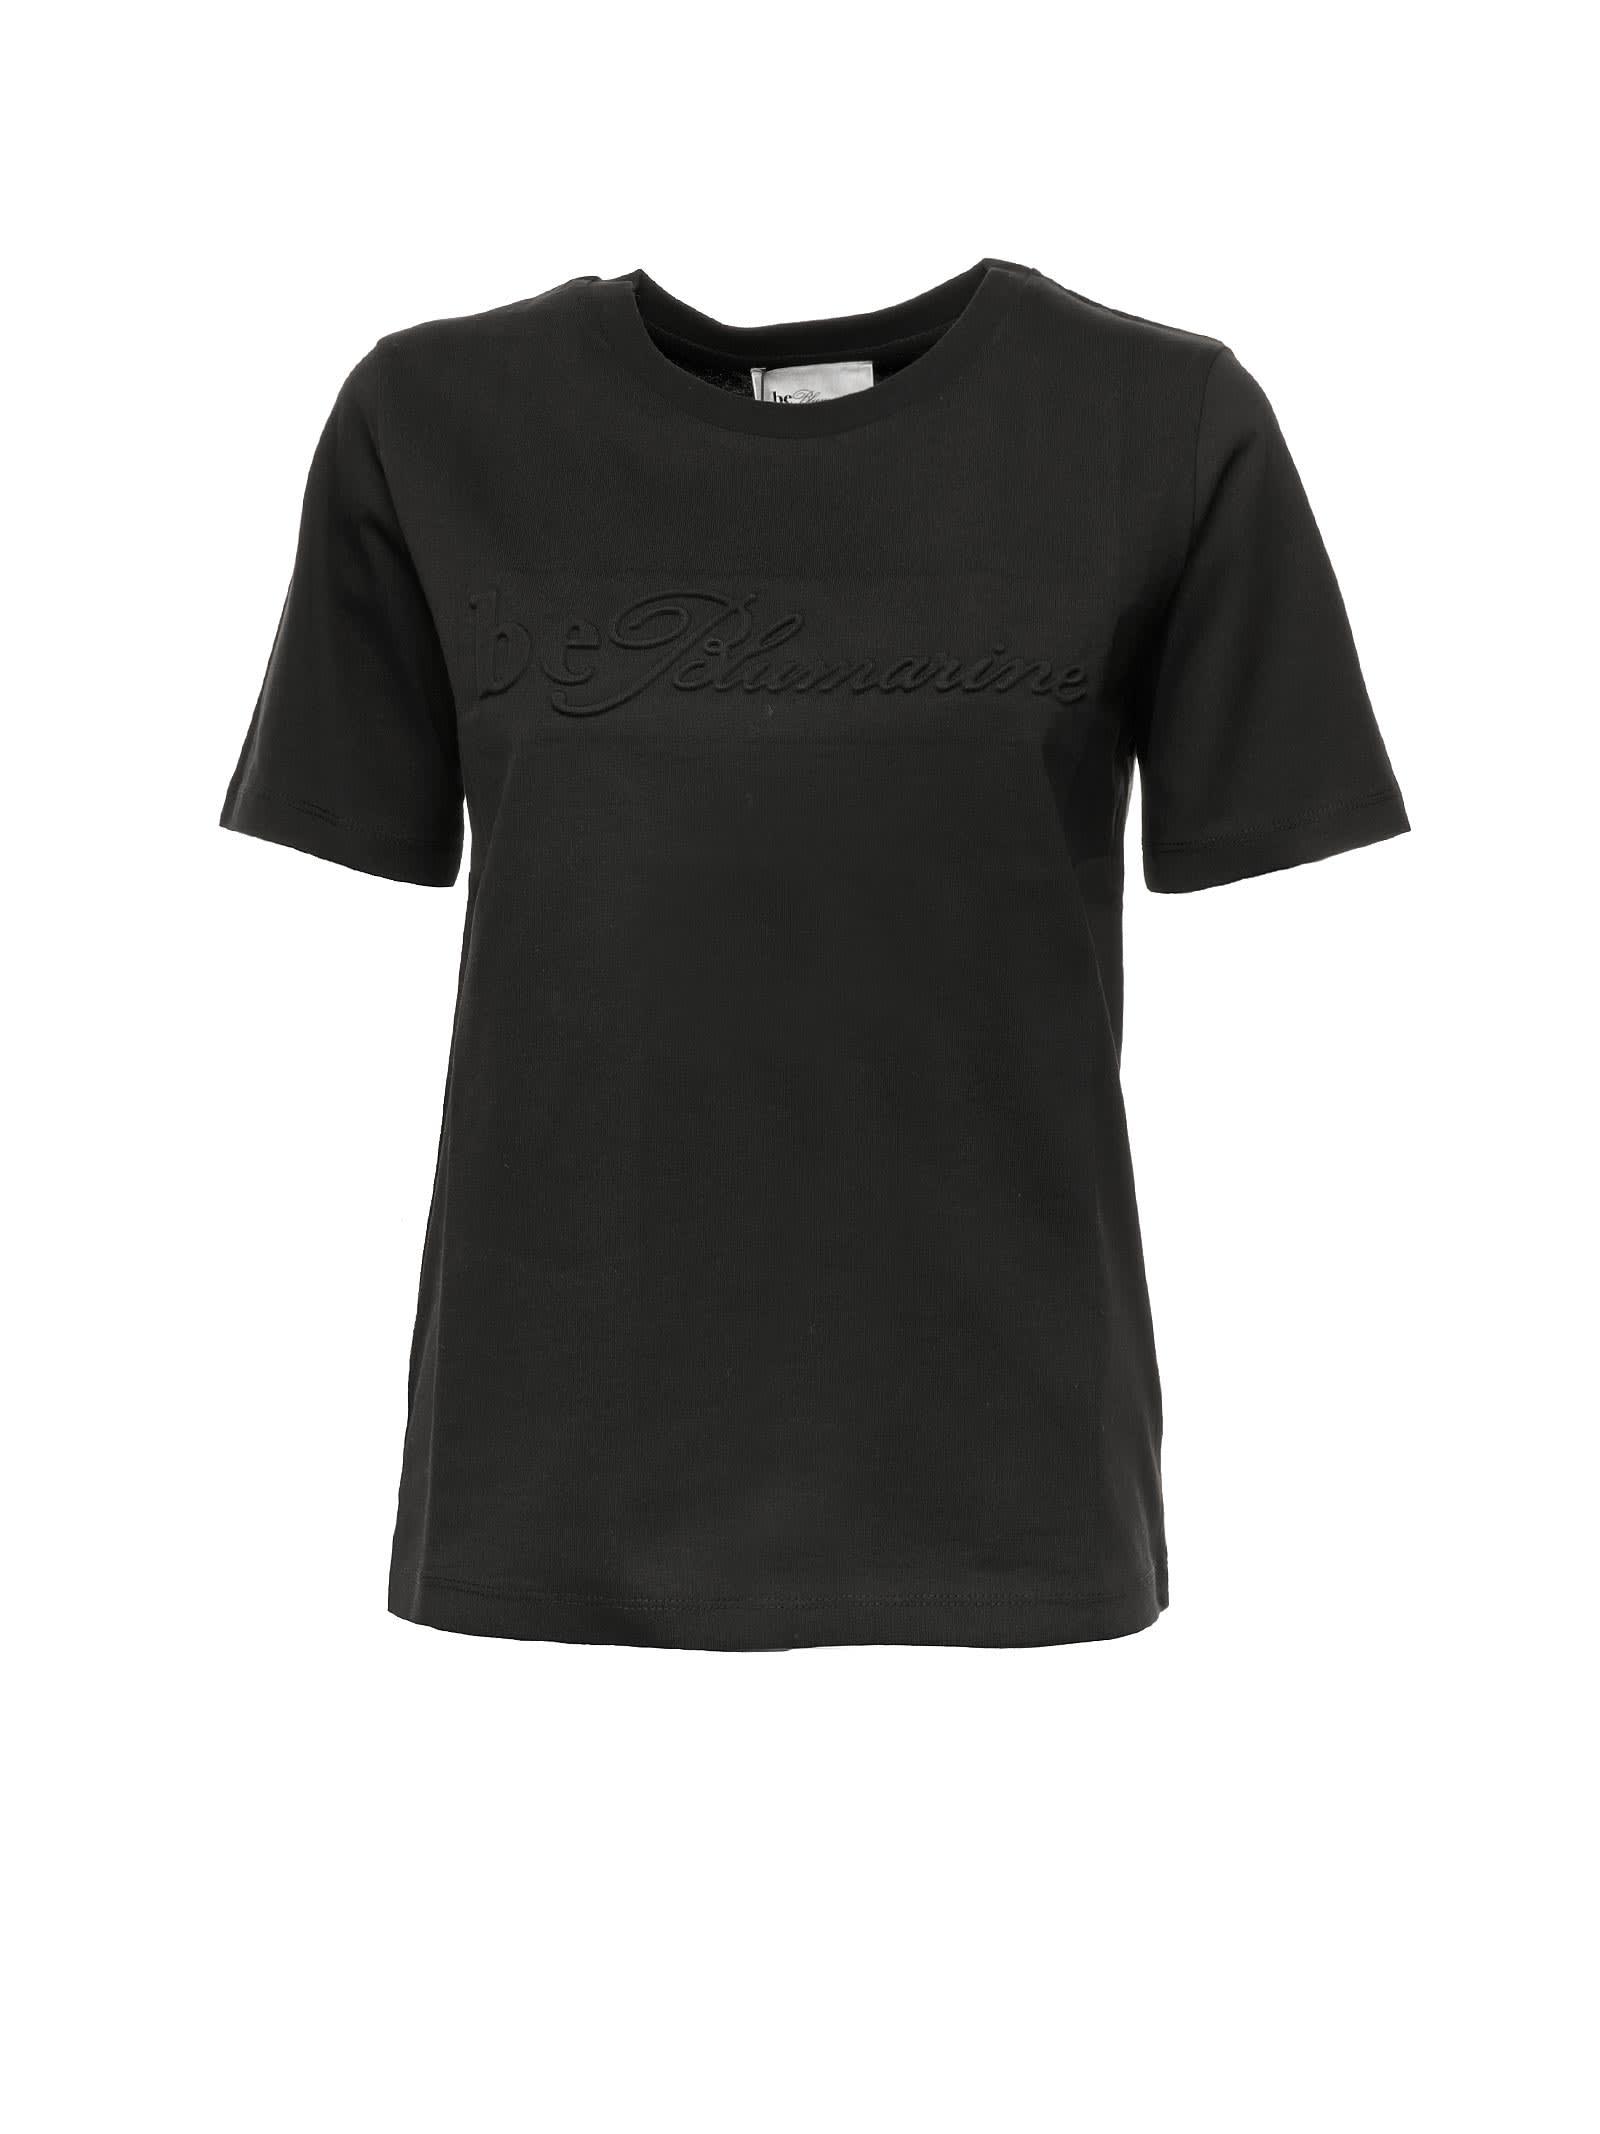 Be Blumarine BLACK T-SHIRT